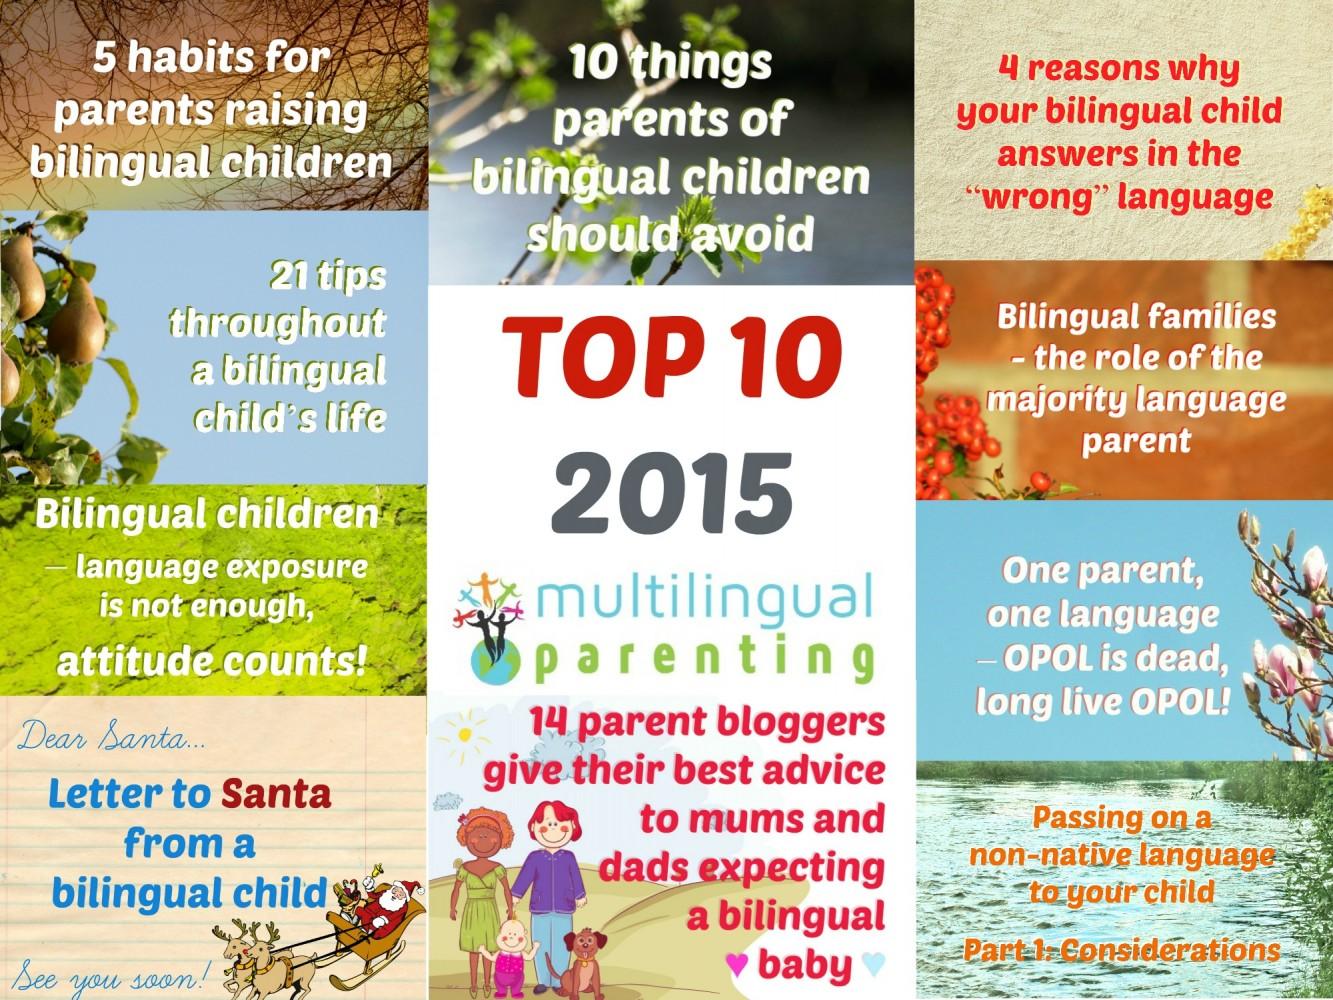 Multilingual Parenting: Top 10 posts of 2015 for parents of bilingual children